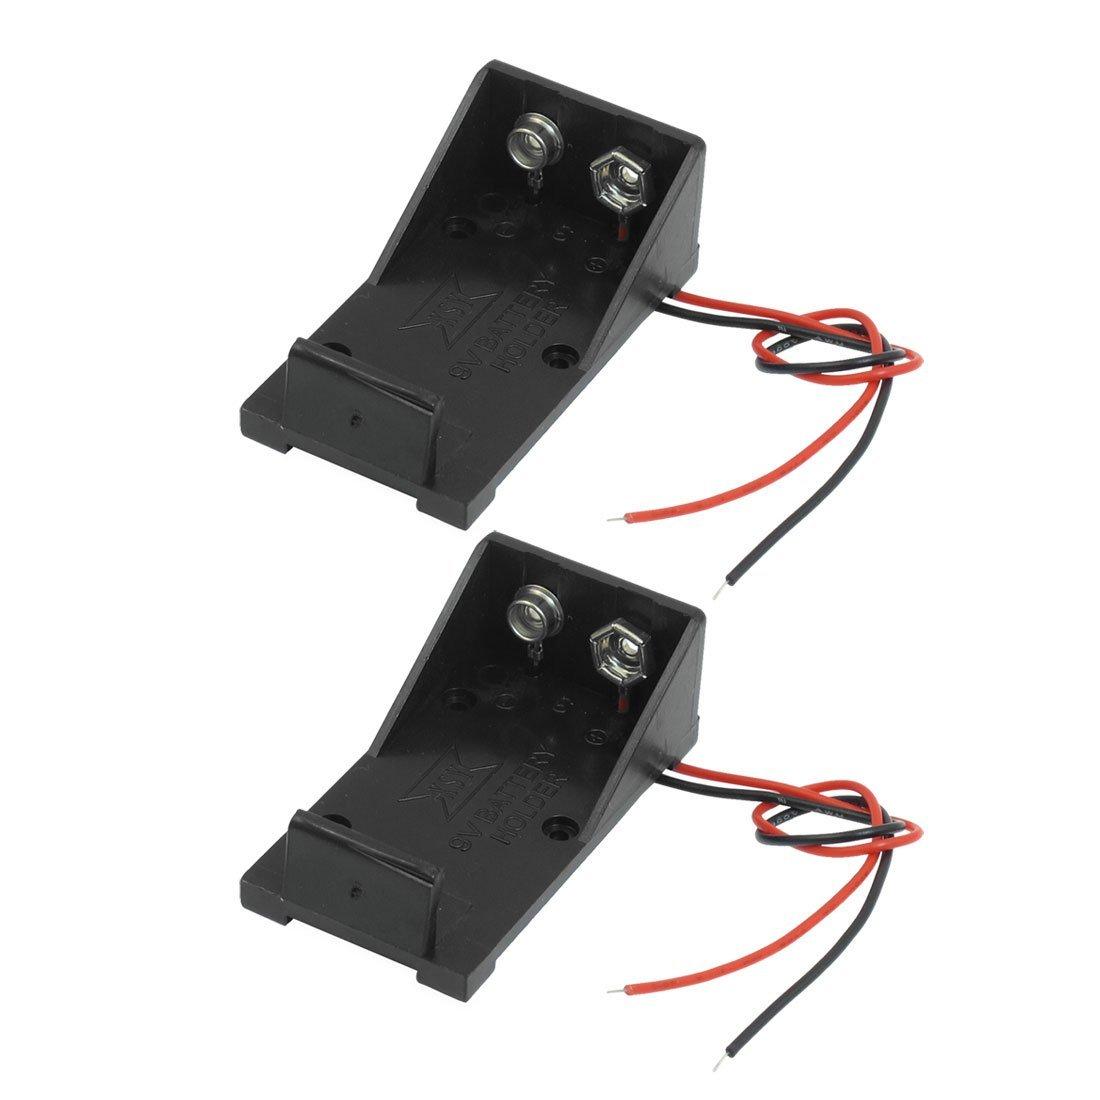 SODIAL(R) 2 Pcs Black Plastic 9V Batteries Battery Case Holder w Wire Leads